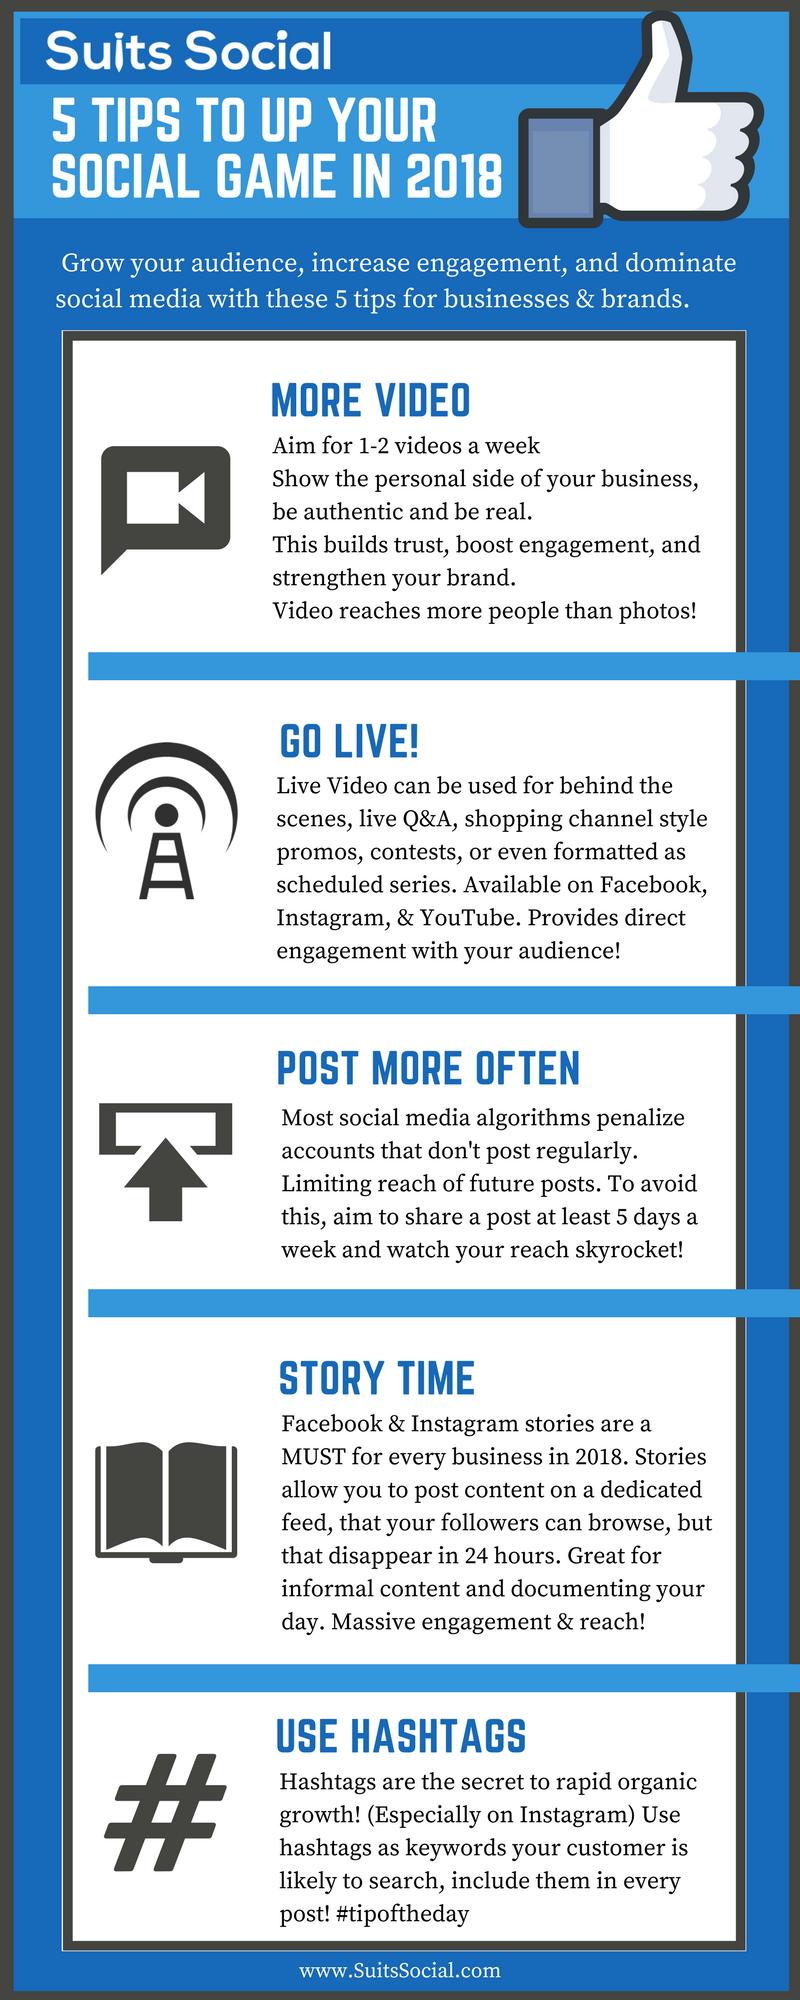 Social-Media-Tips-2018.png